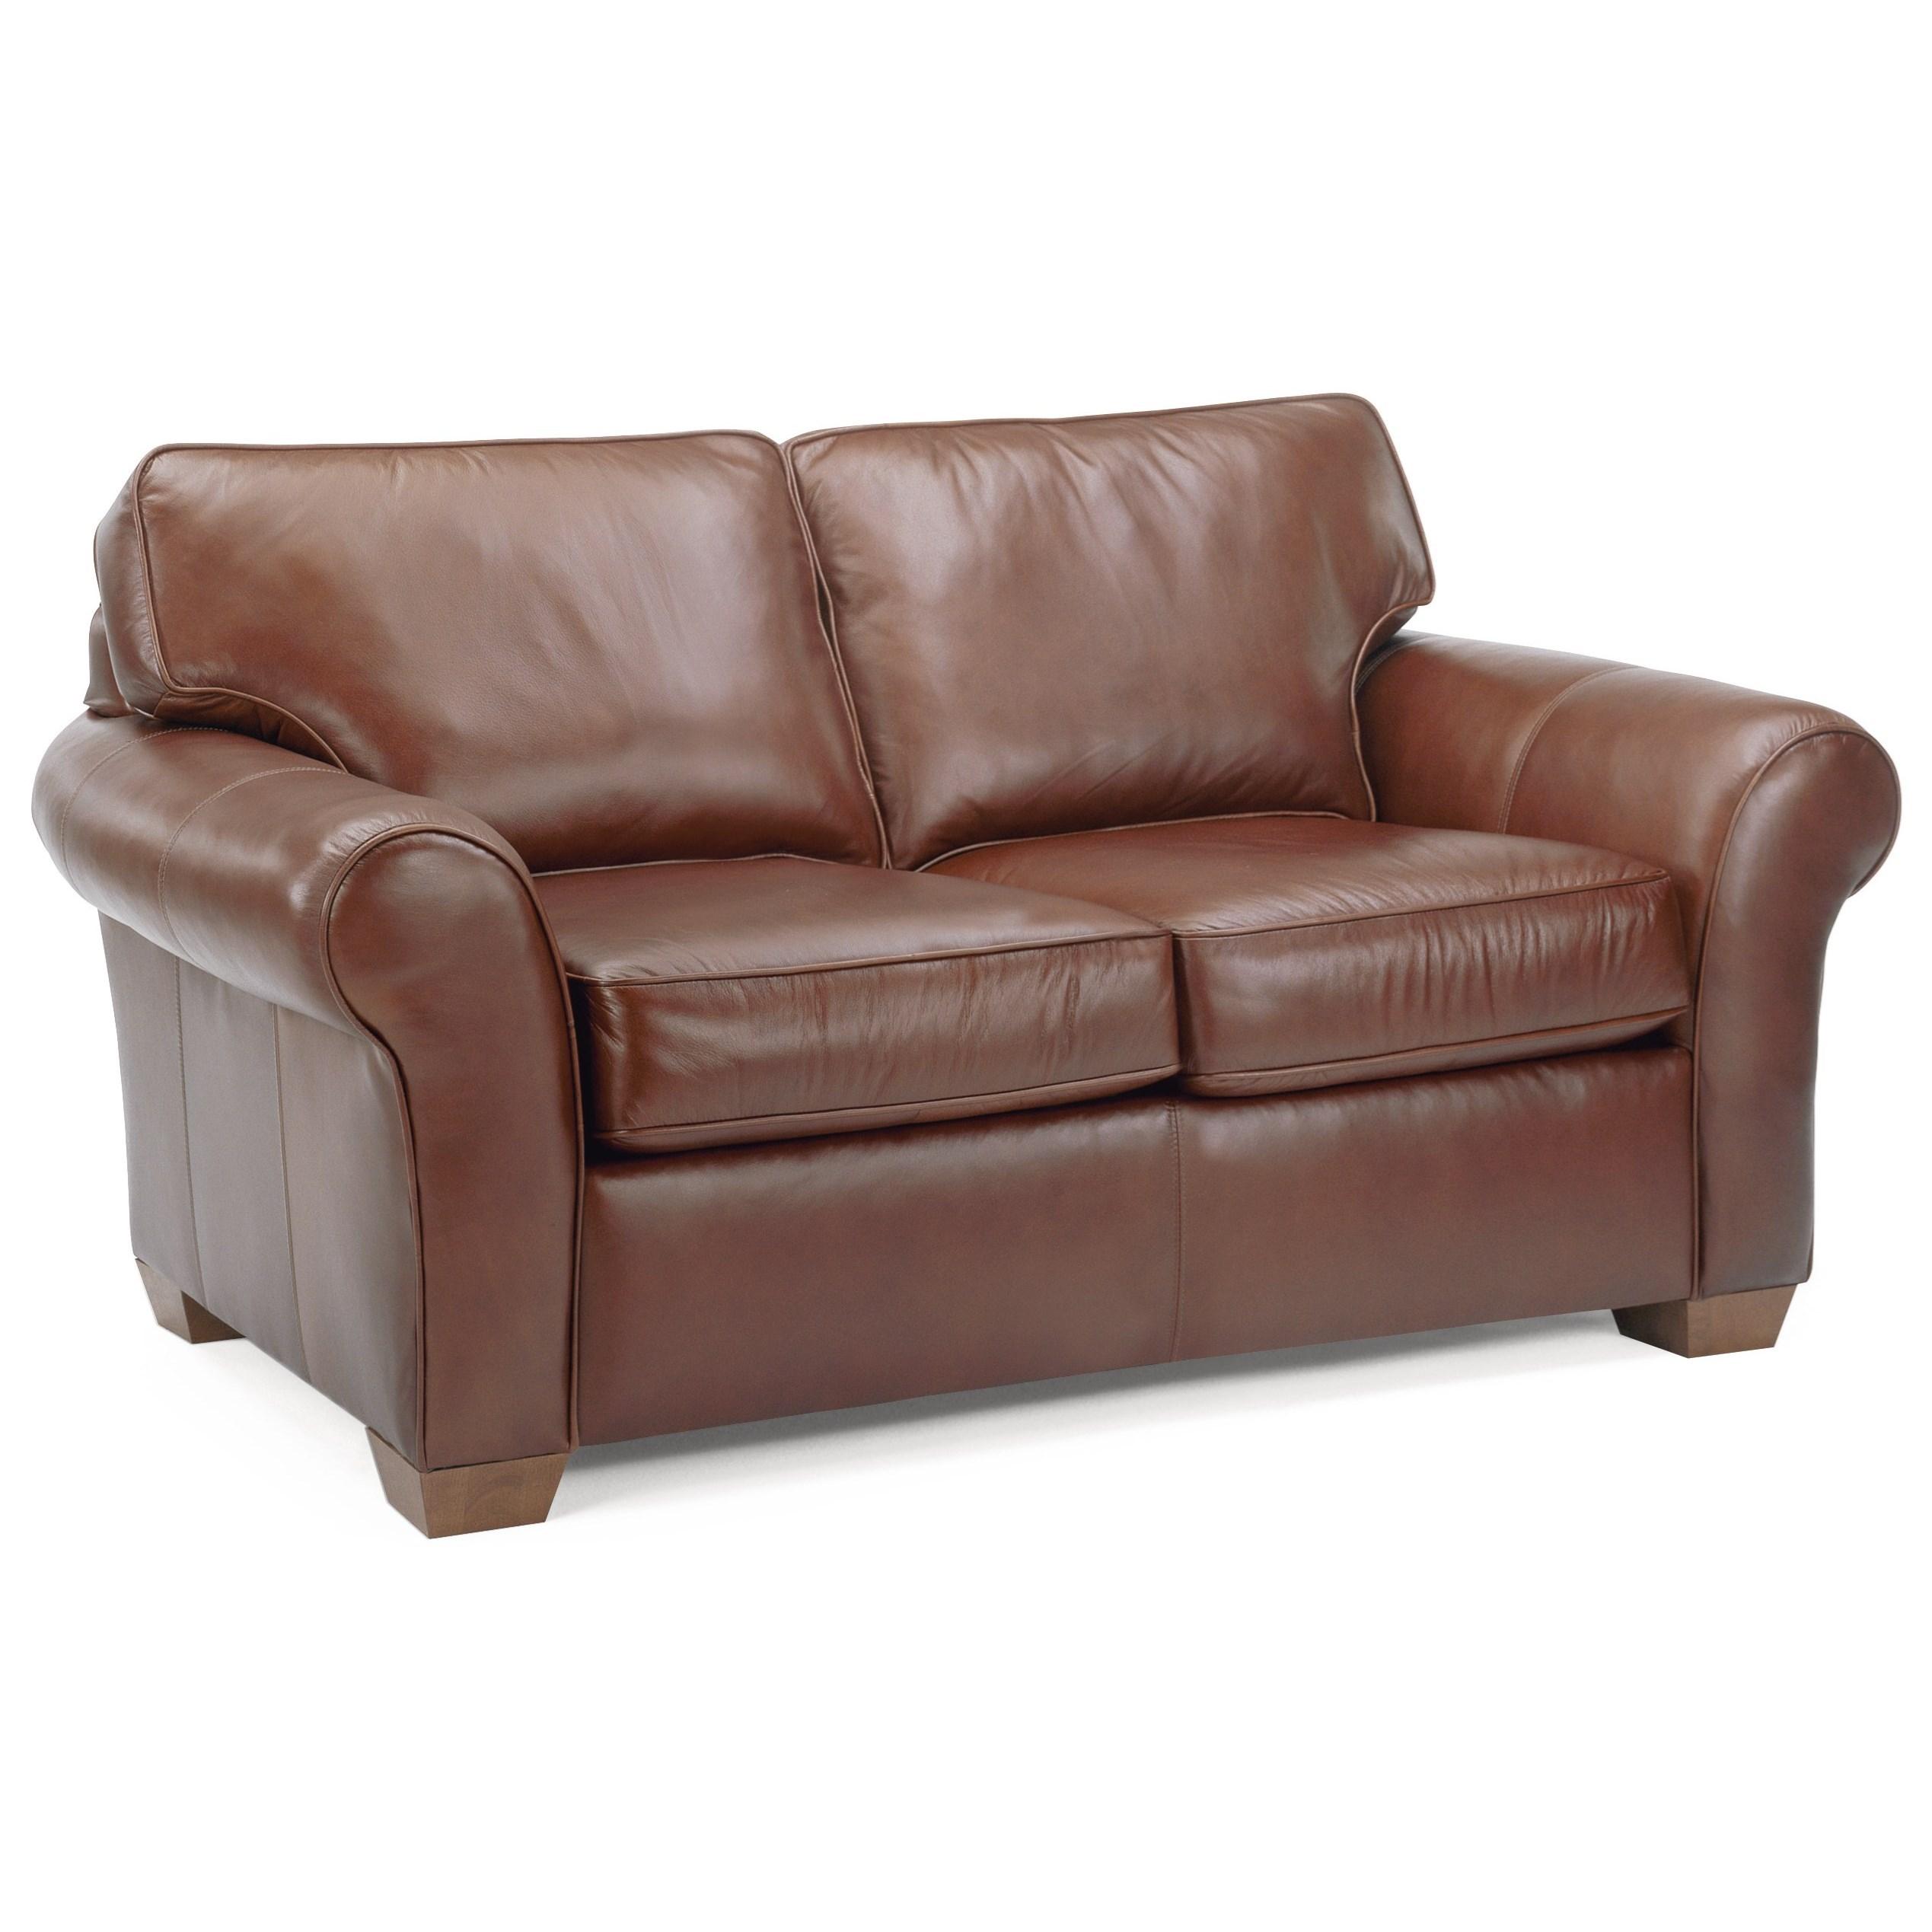 Flexsteel vail 71 vail love seat wayside furniture for Wayside furniture